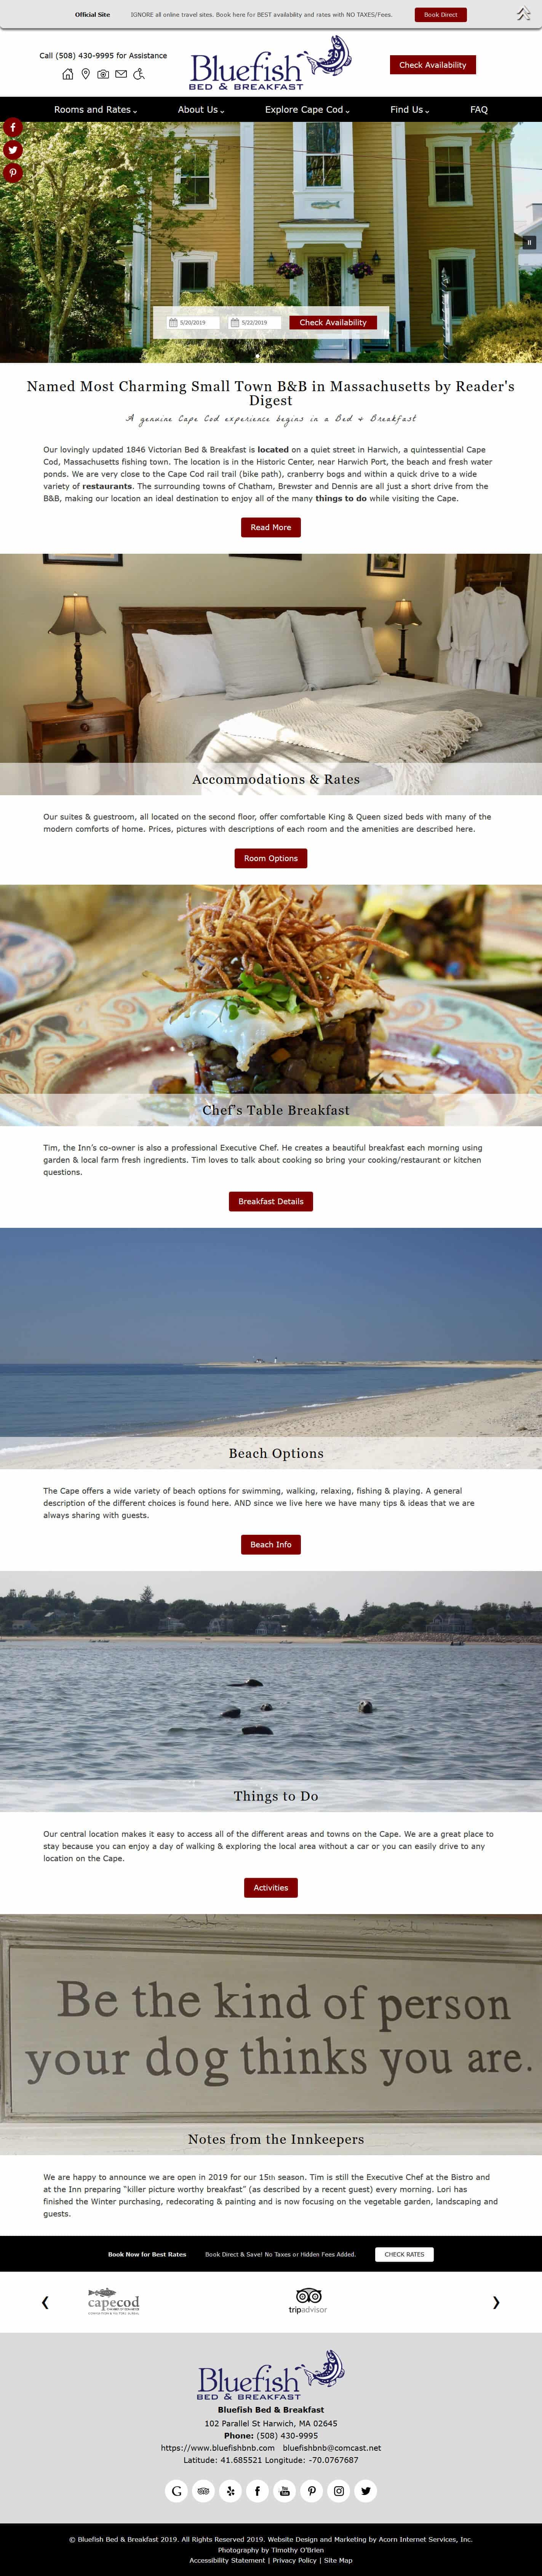 Bluefish Bed & Breakfast website design